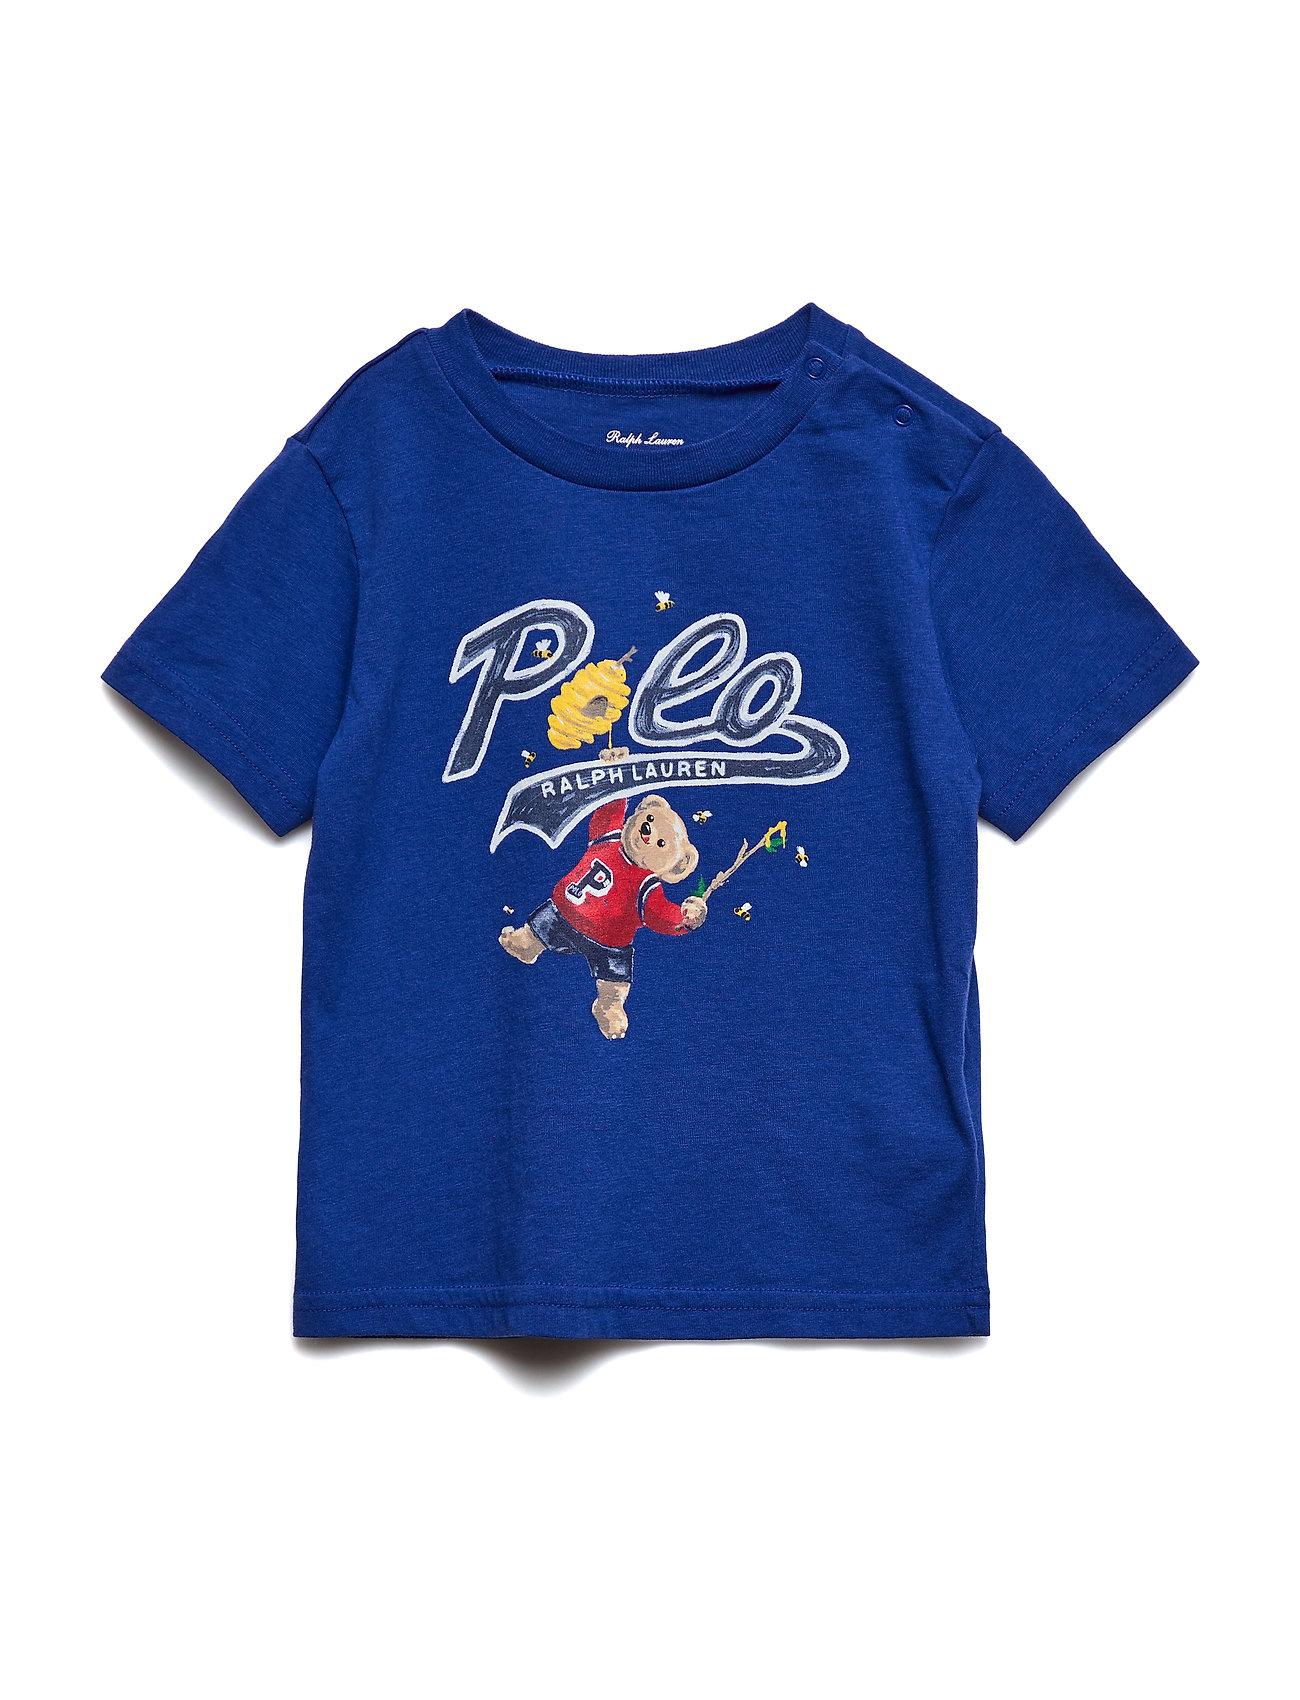 Ralph Lauren Baby Honey Bear Cotton Jersey Tee - RUGBY ROYAL